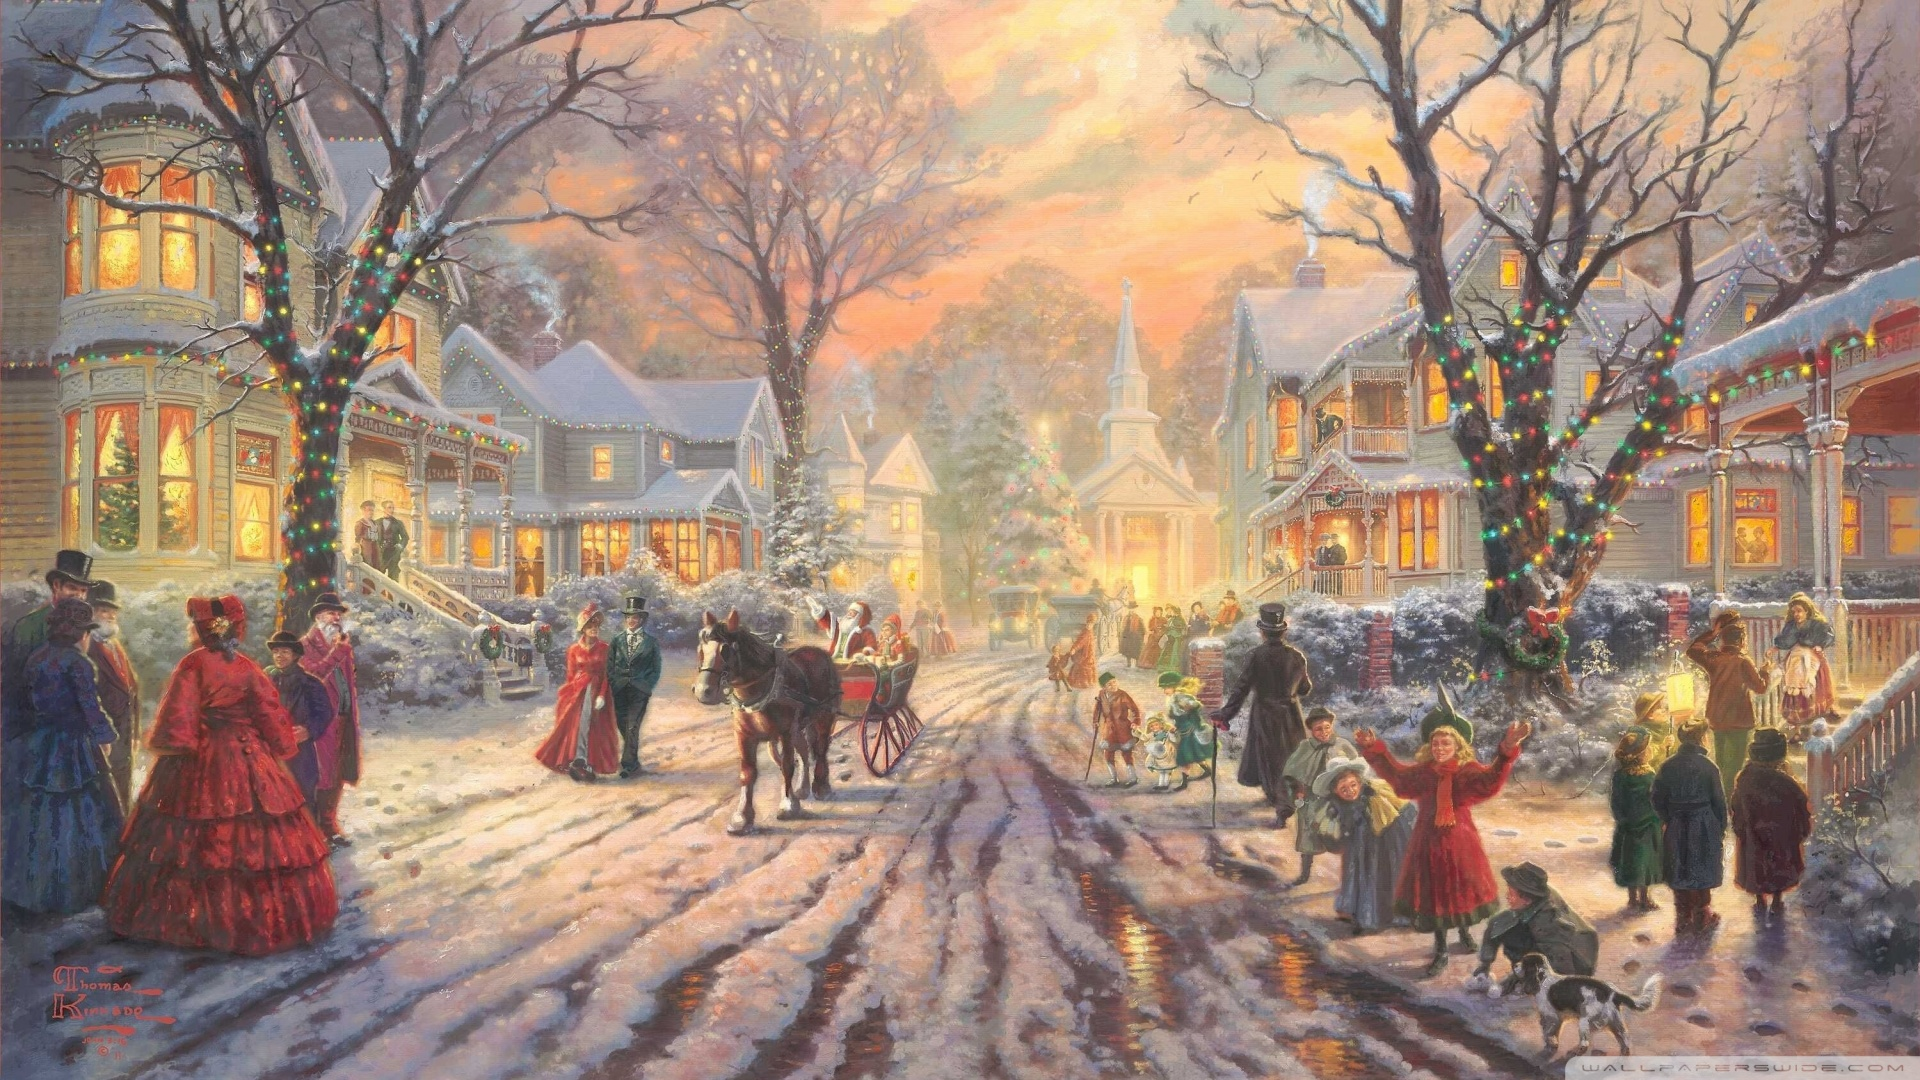 Victorian Christmas Carol By Thomas Kinkade Wallpaper 1920x1080 1920x1080